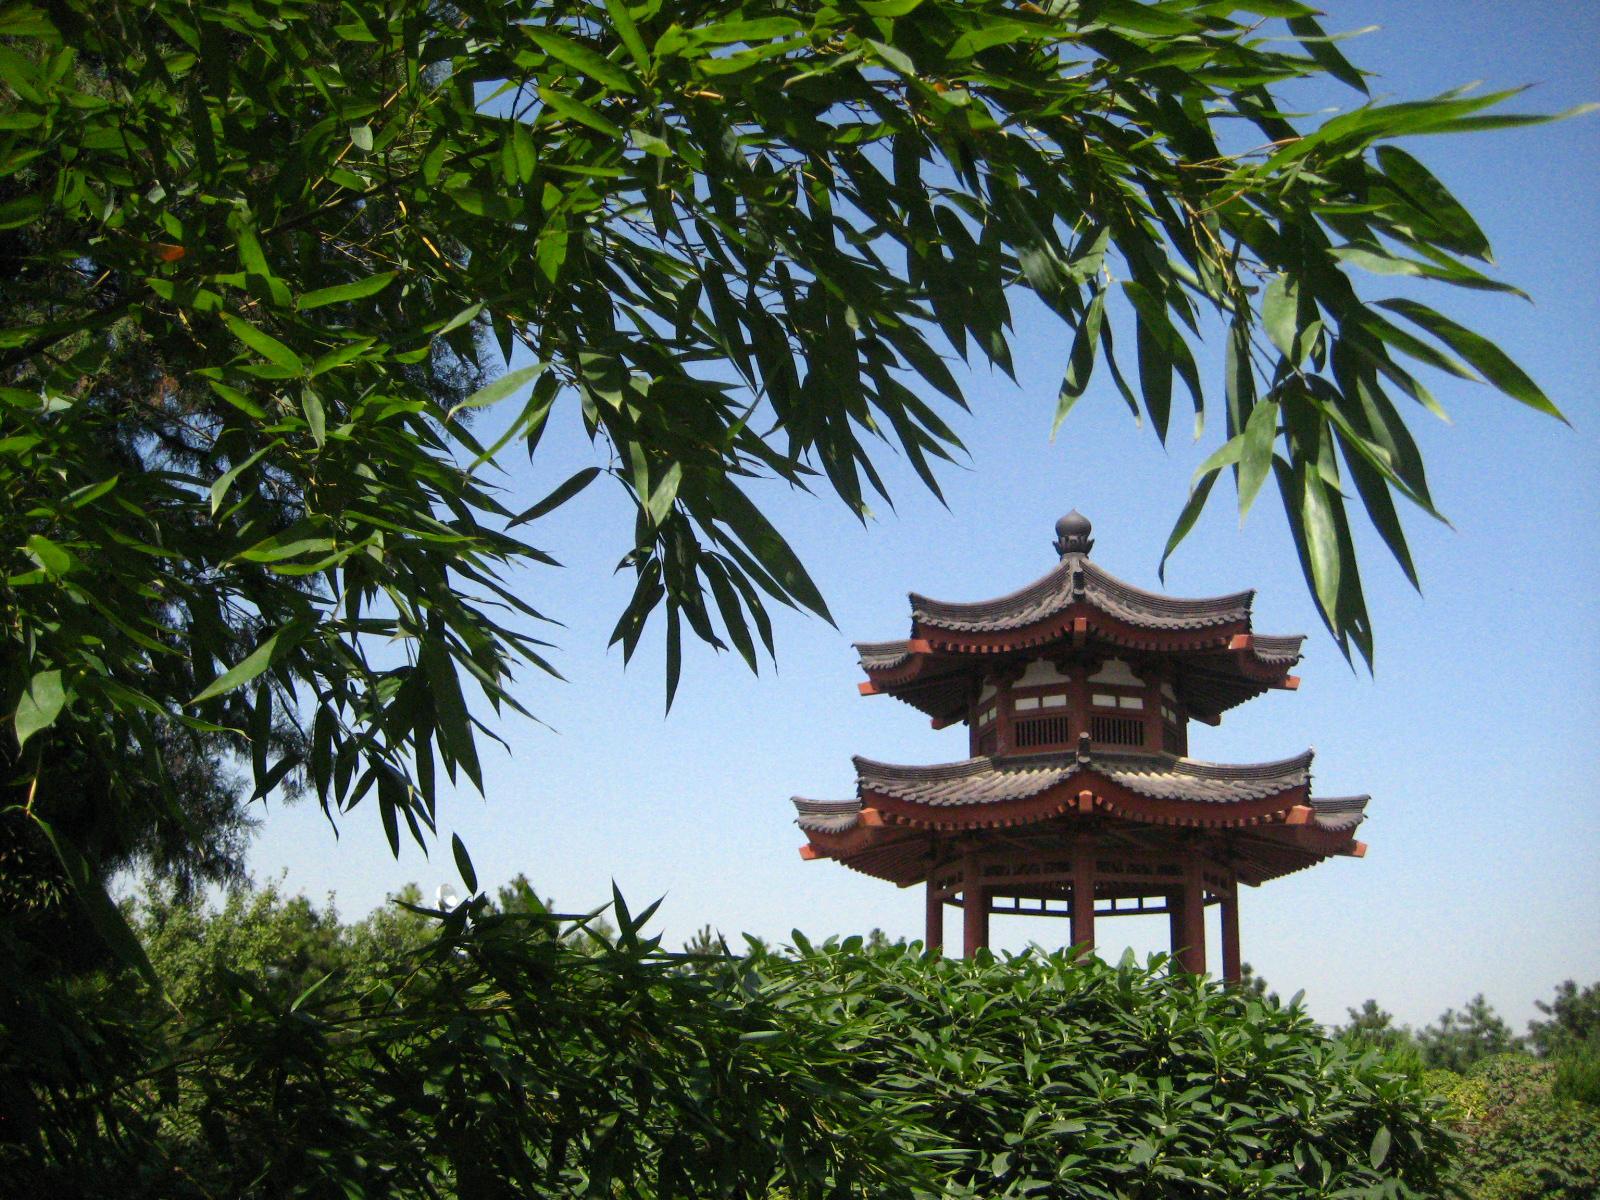 Giardino buddista a XiAn